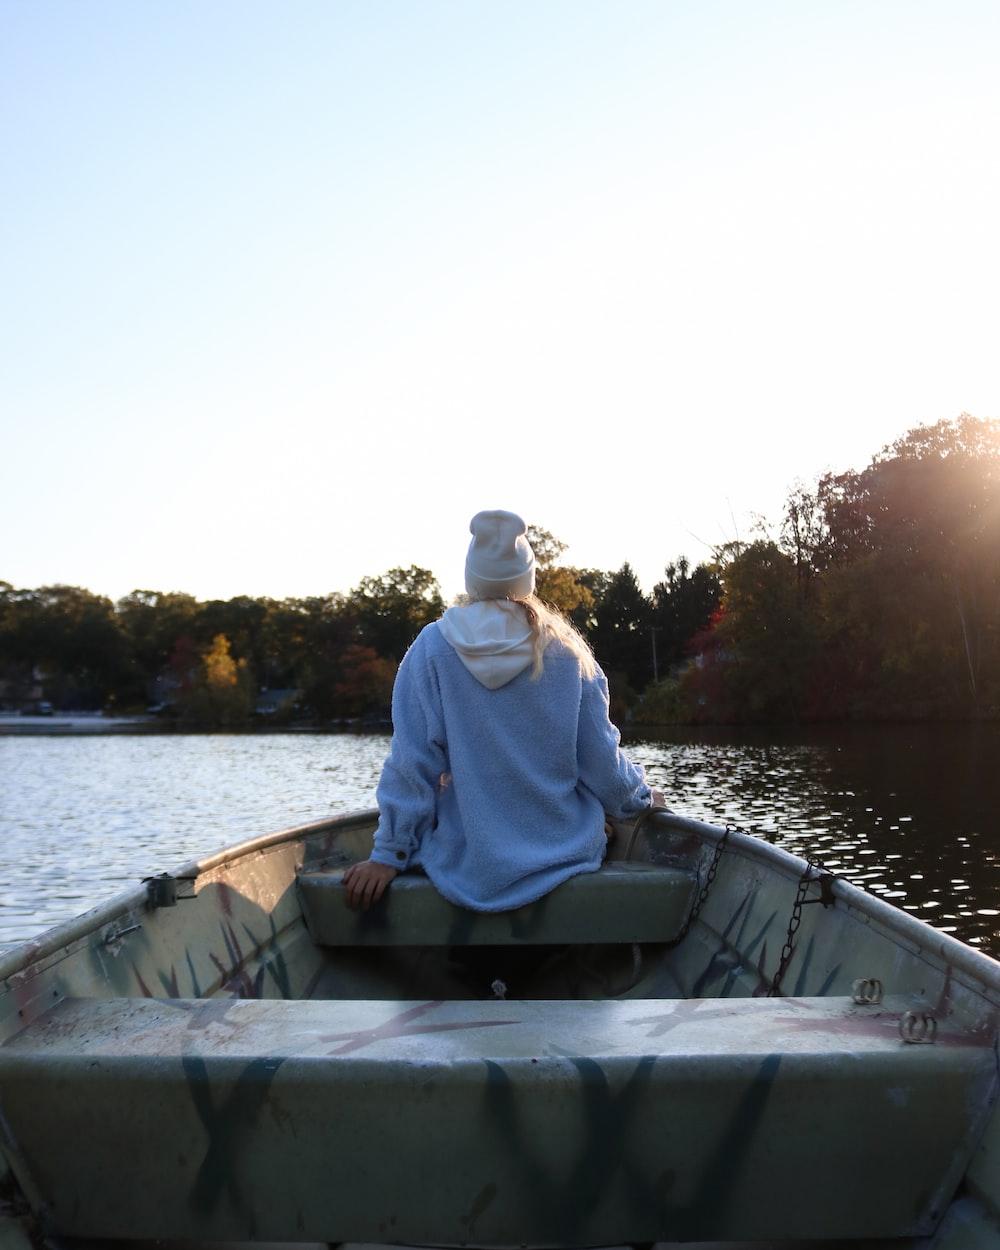 man in white dress shirt sitting on boat during daytime